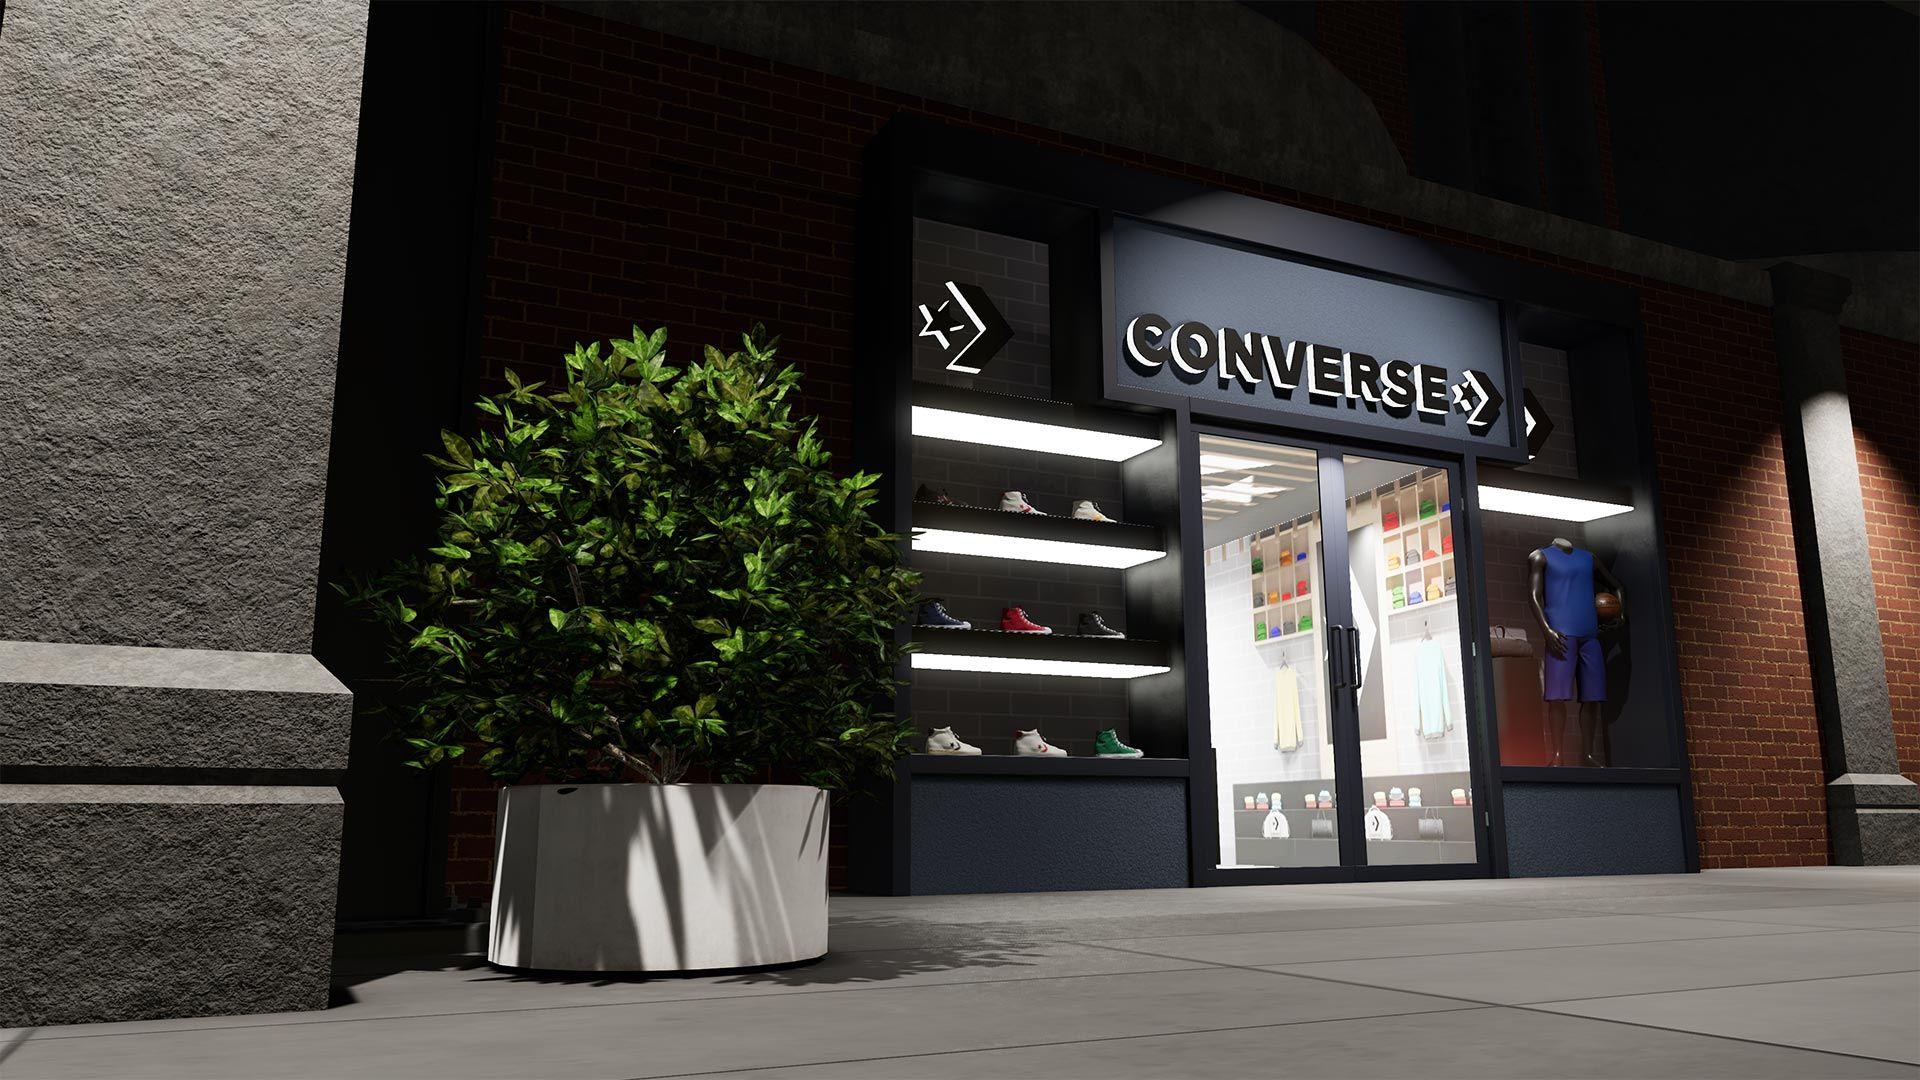 NBA 2K The City Converse Store